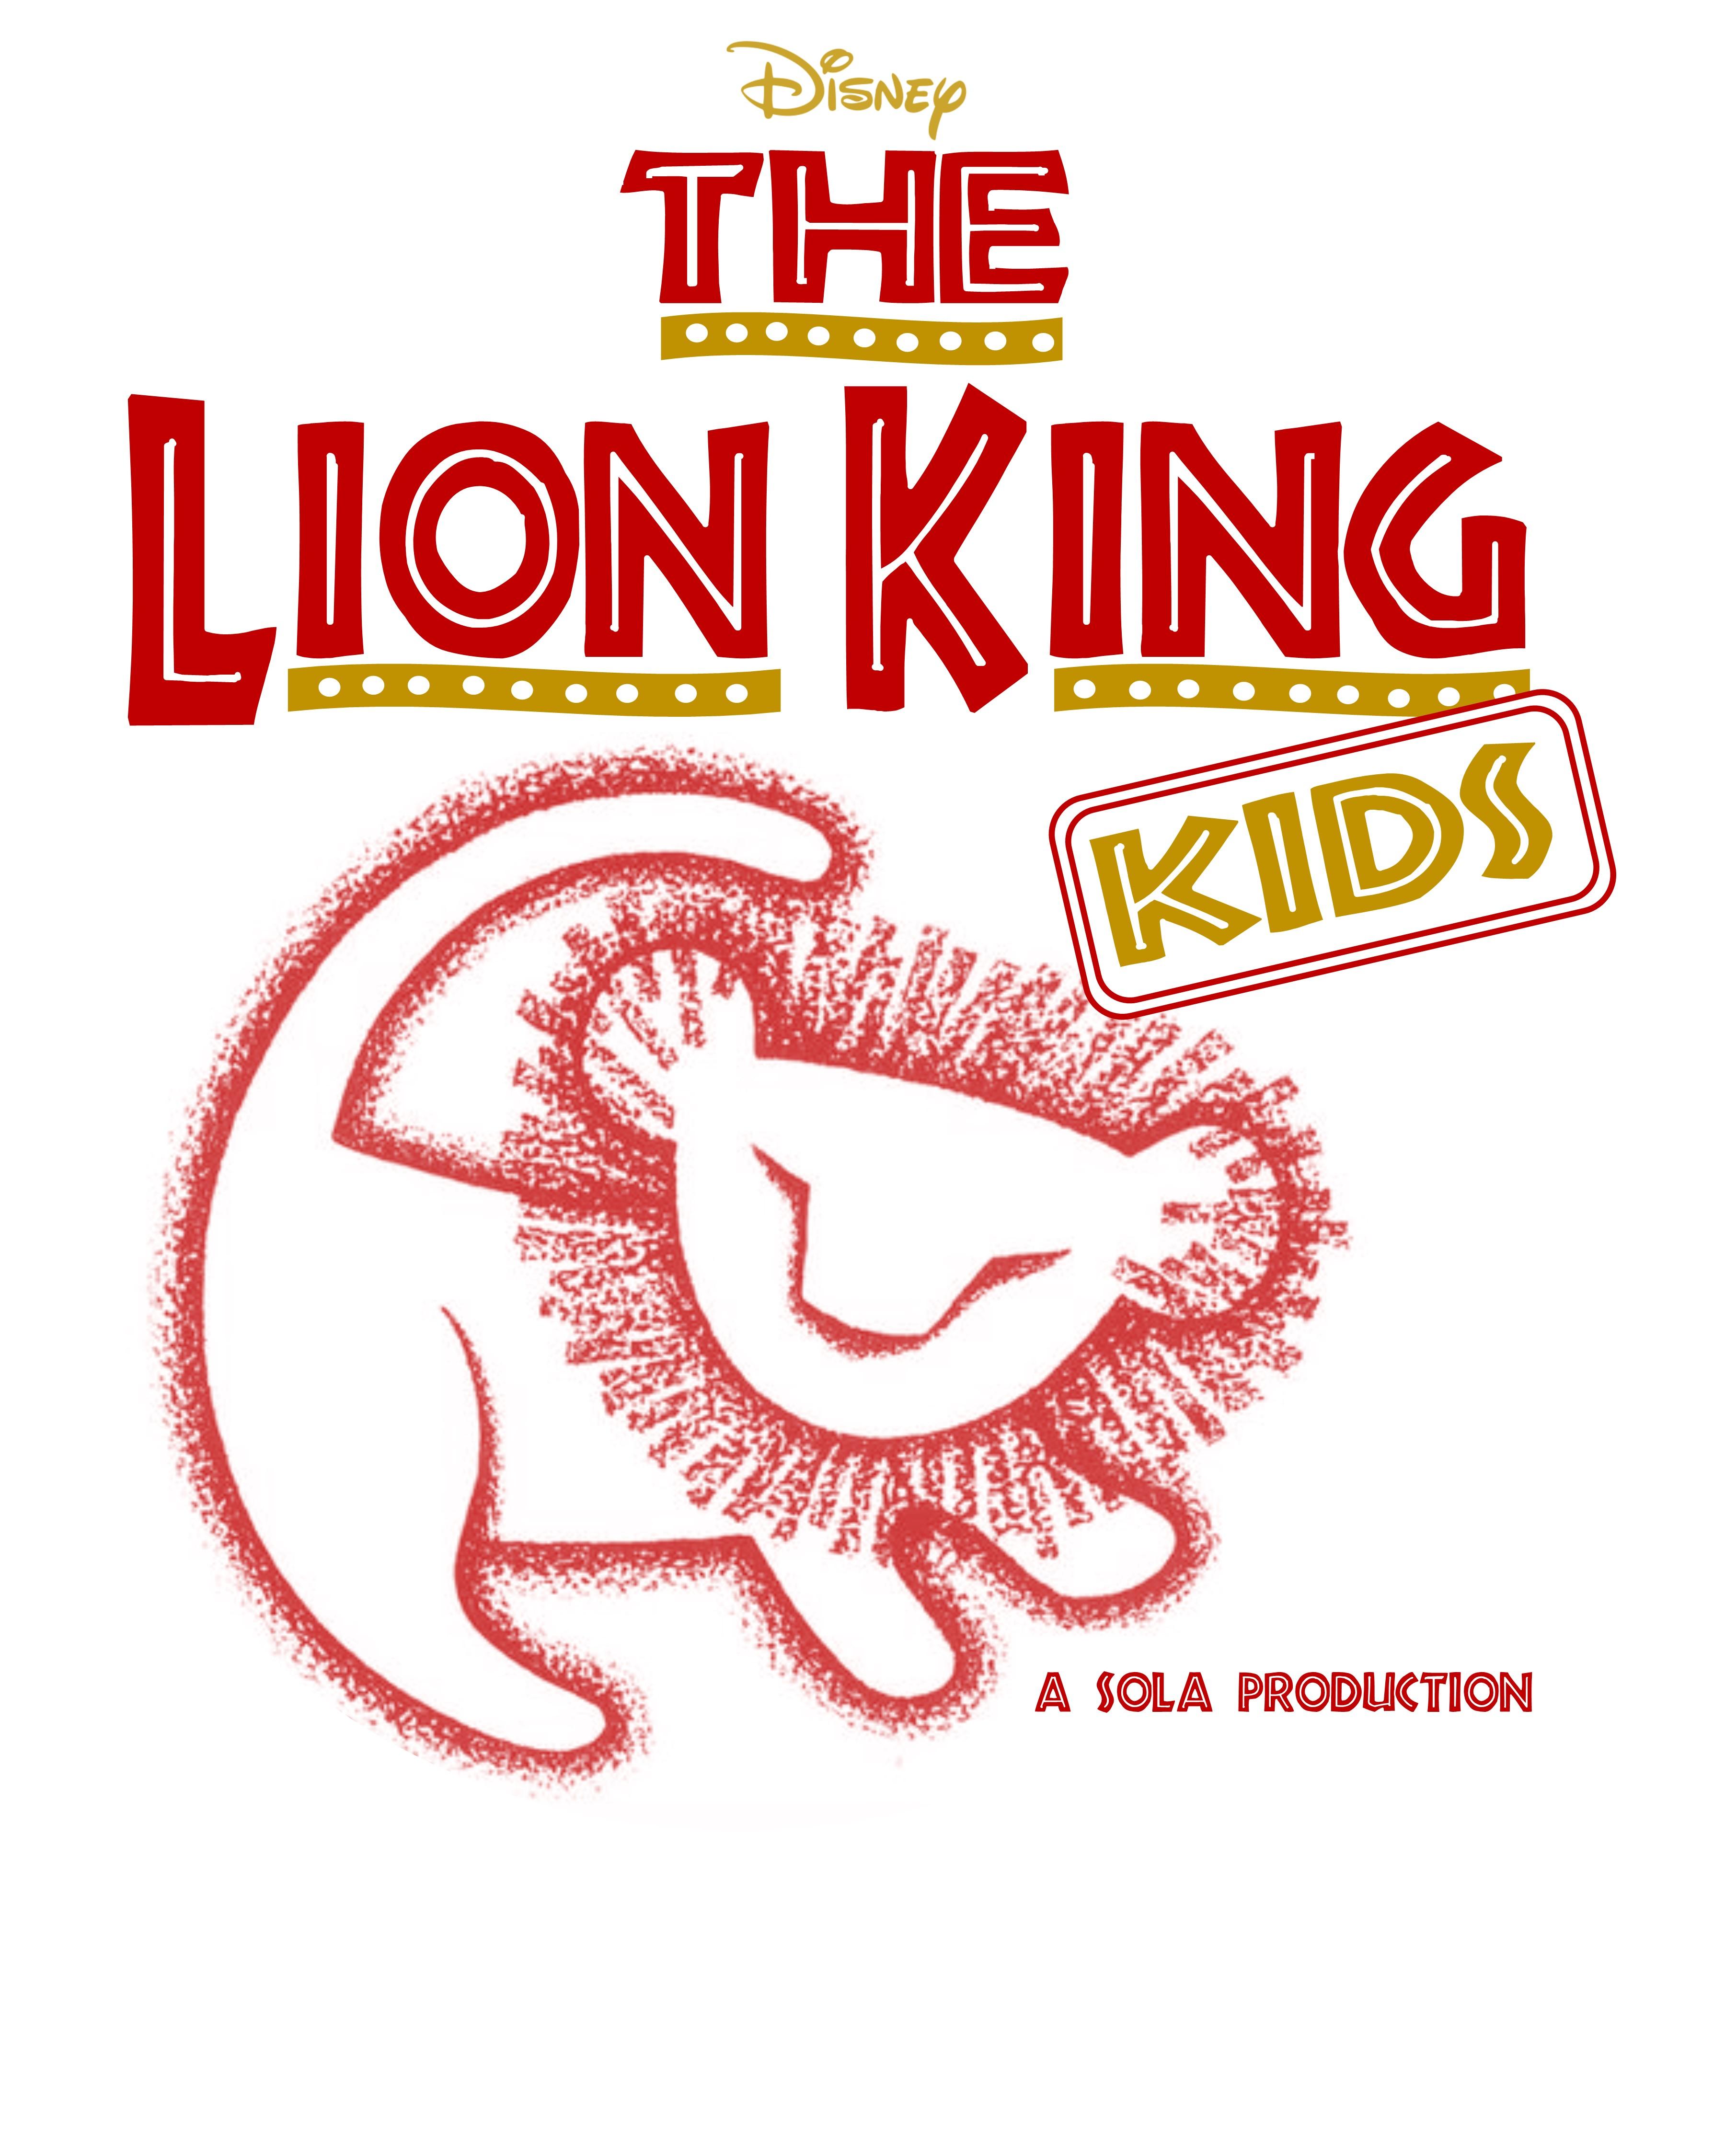 Disney's The Lion King Kids!